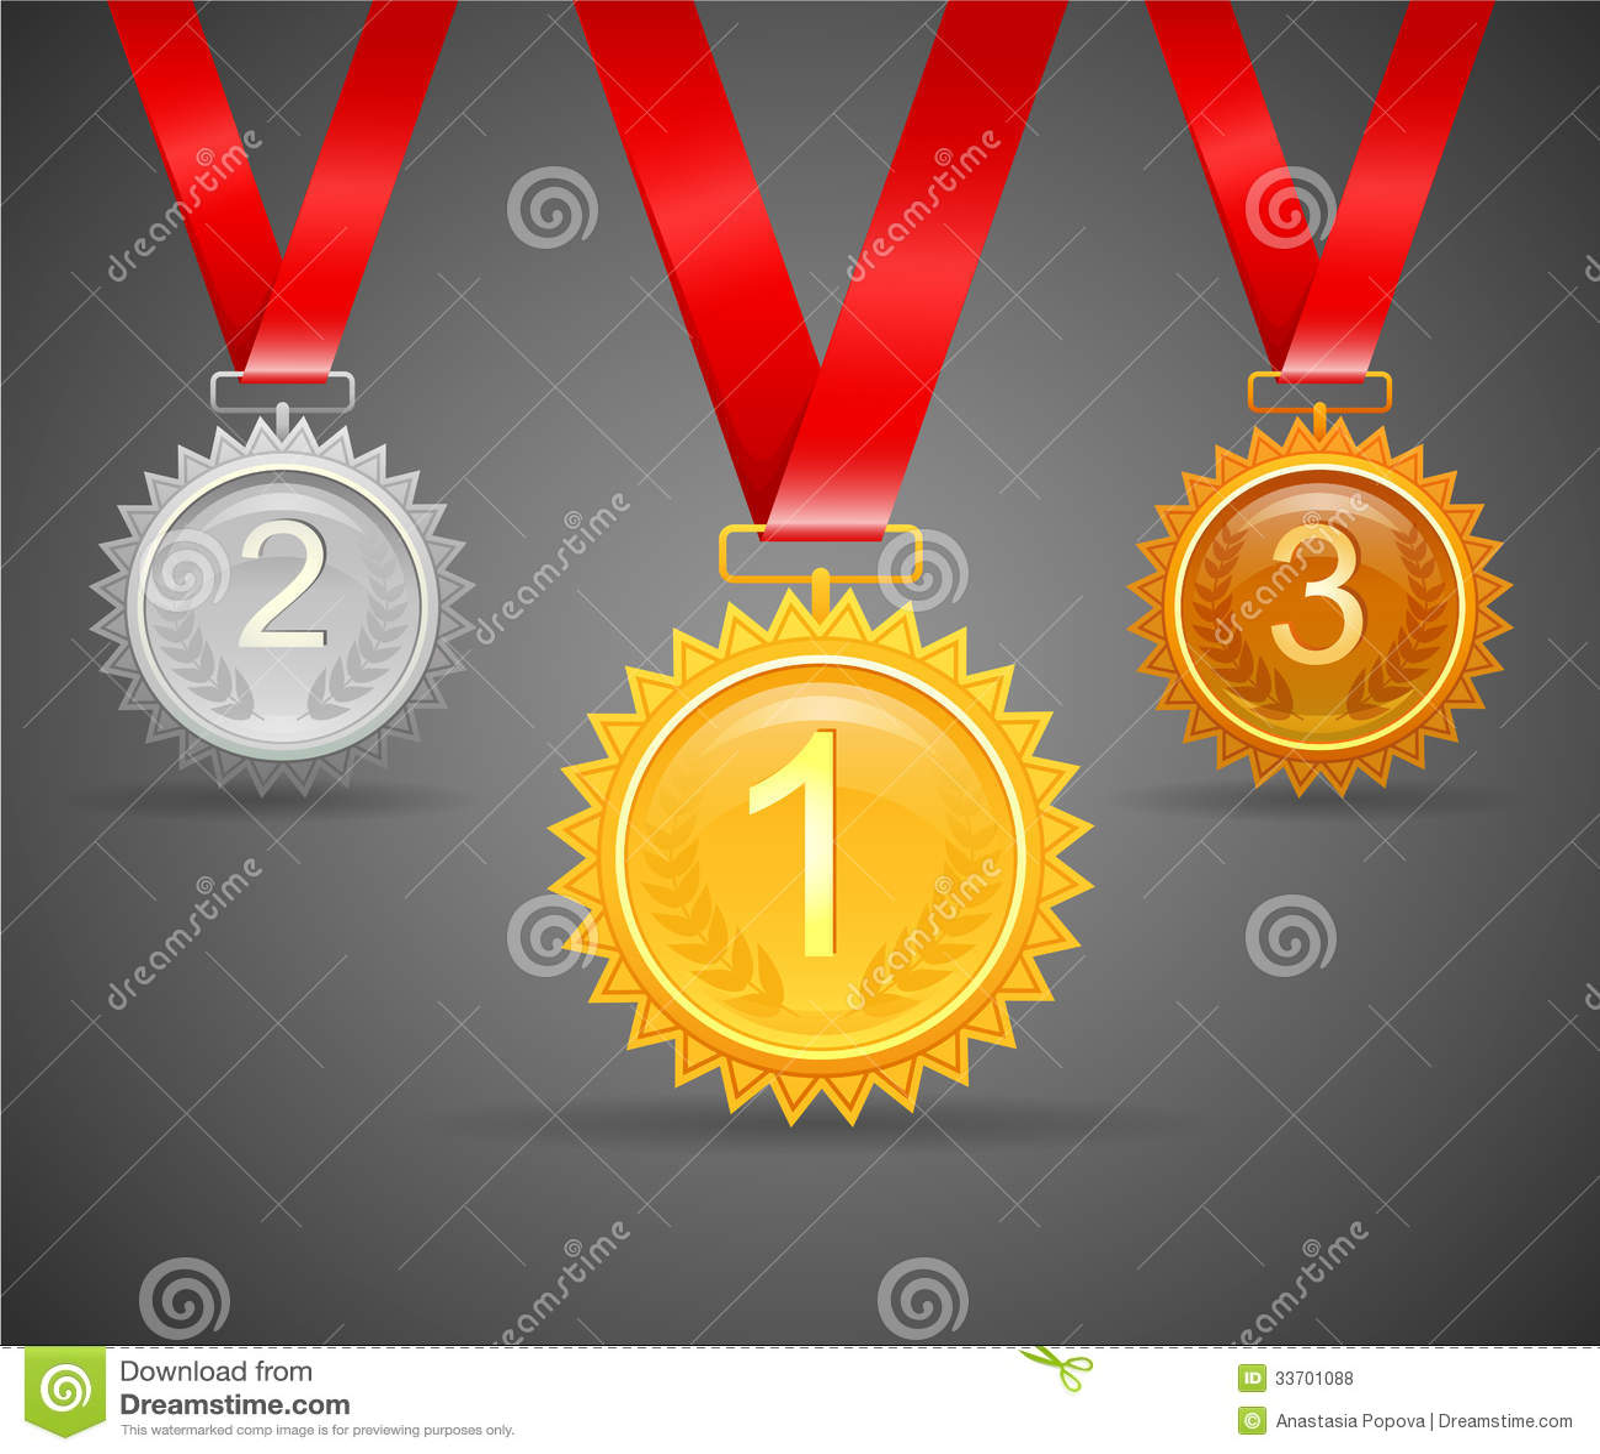 Drie medailles voor toekenning